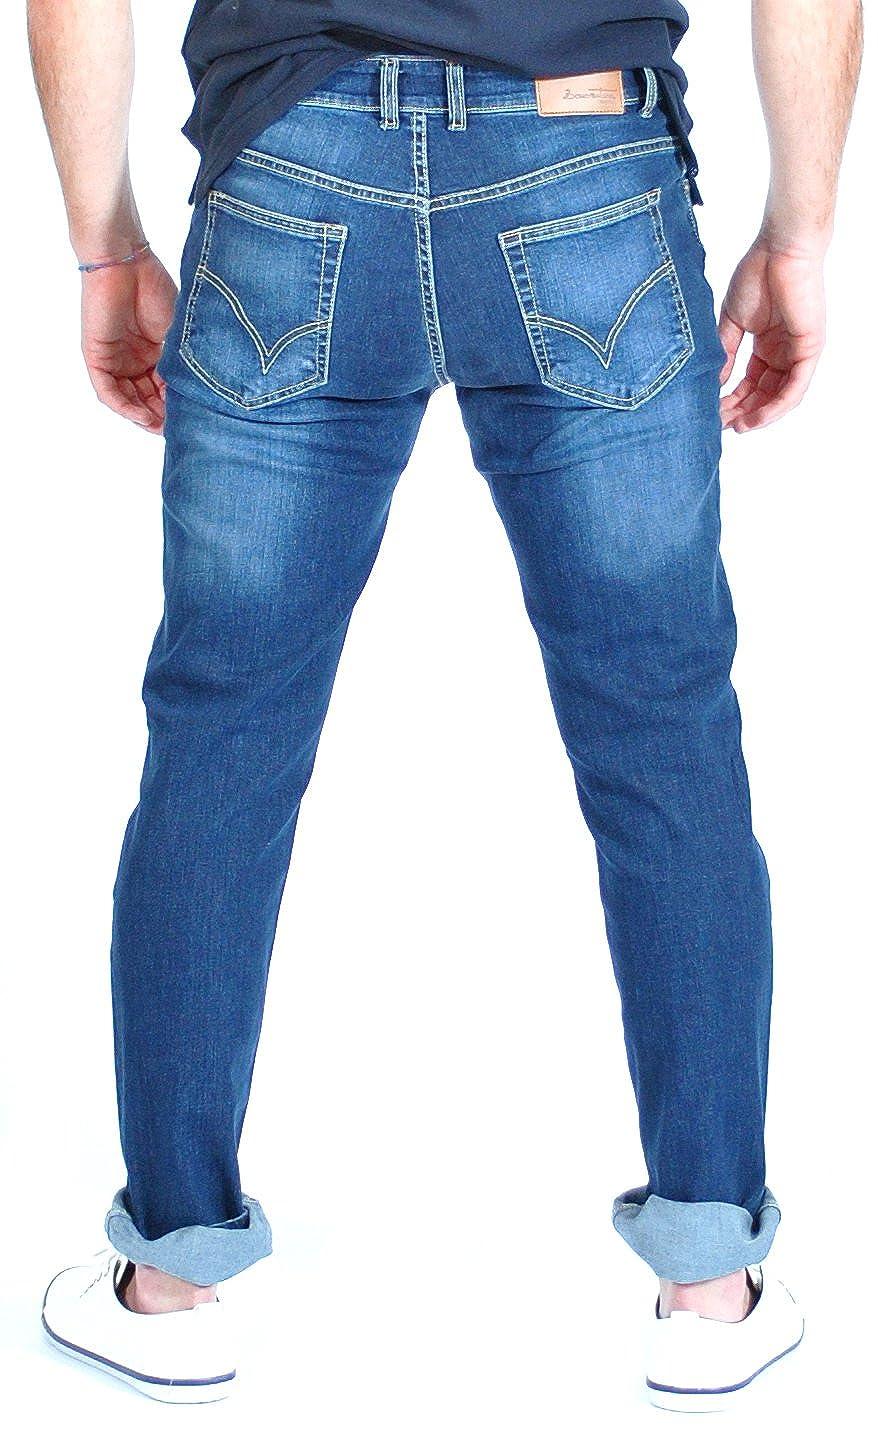 HommeVêtements Bonaventure Et Bonaventure Pantalon Et HommeVêtements Pantalon Bonaventure HommeVêtements Accessoires Accessoires Pantalon oeQrCxBdW